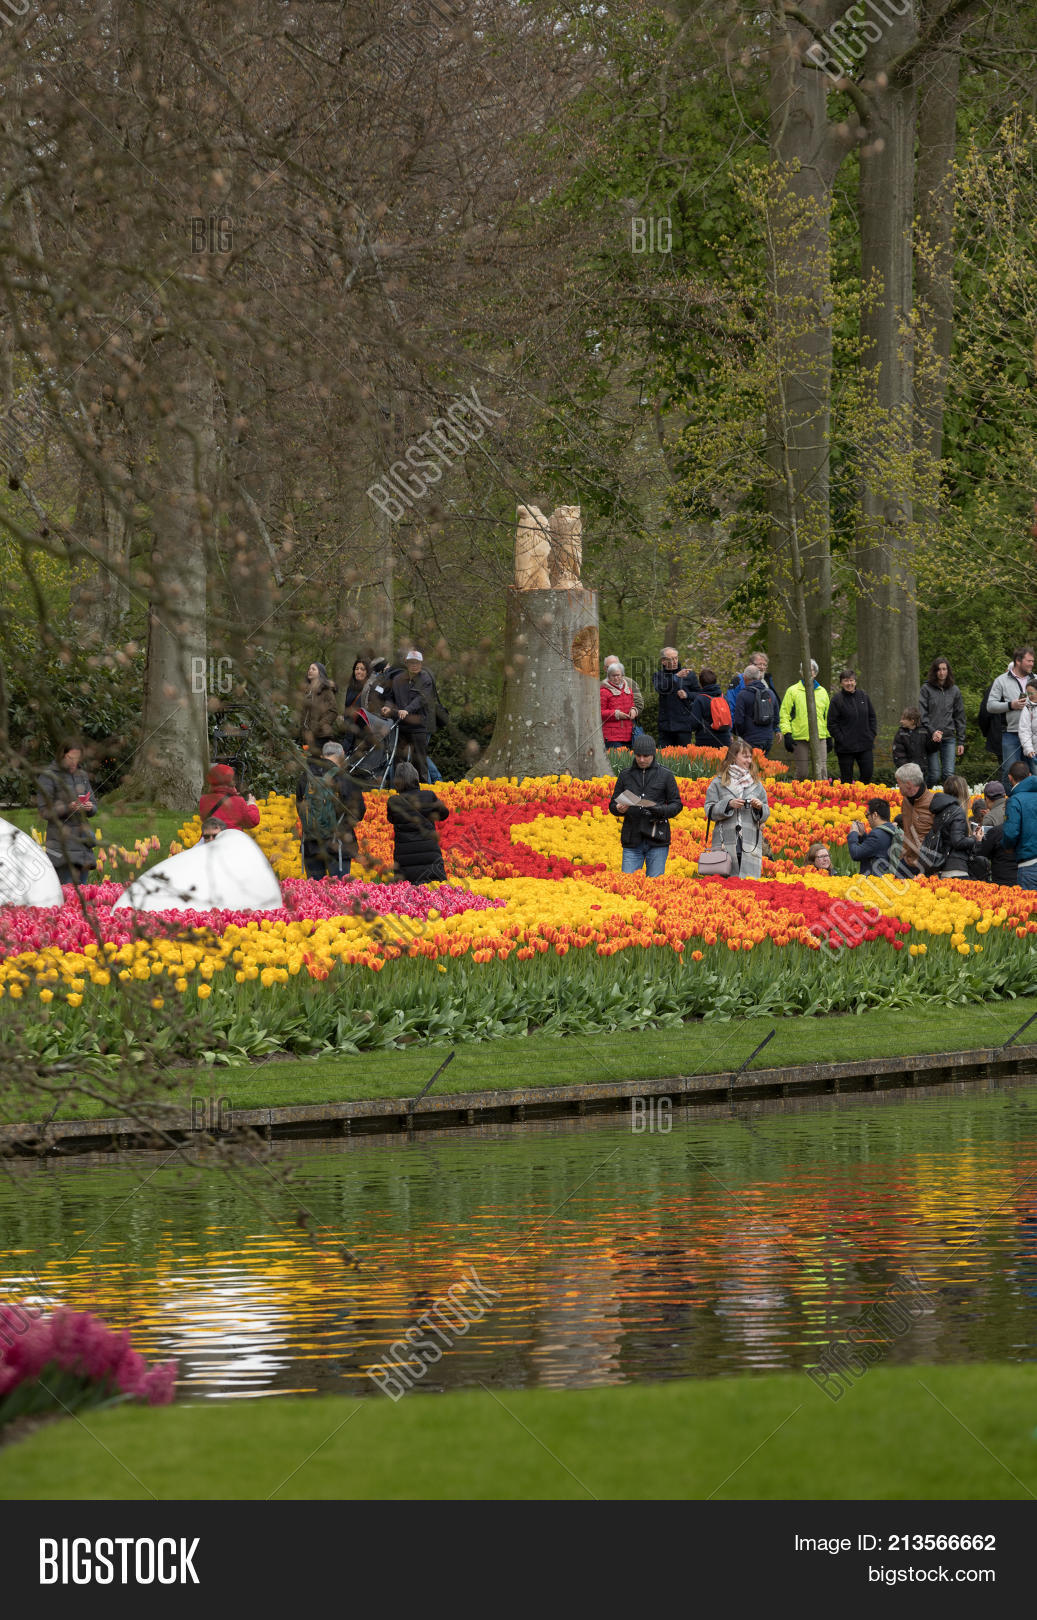 LISSE NETHERLANDS - Image & Photo (Free Trial) | Bigstock